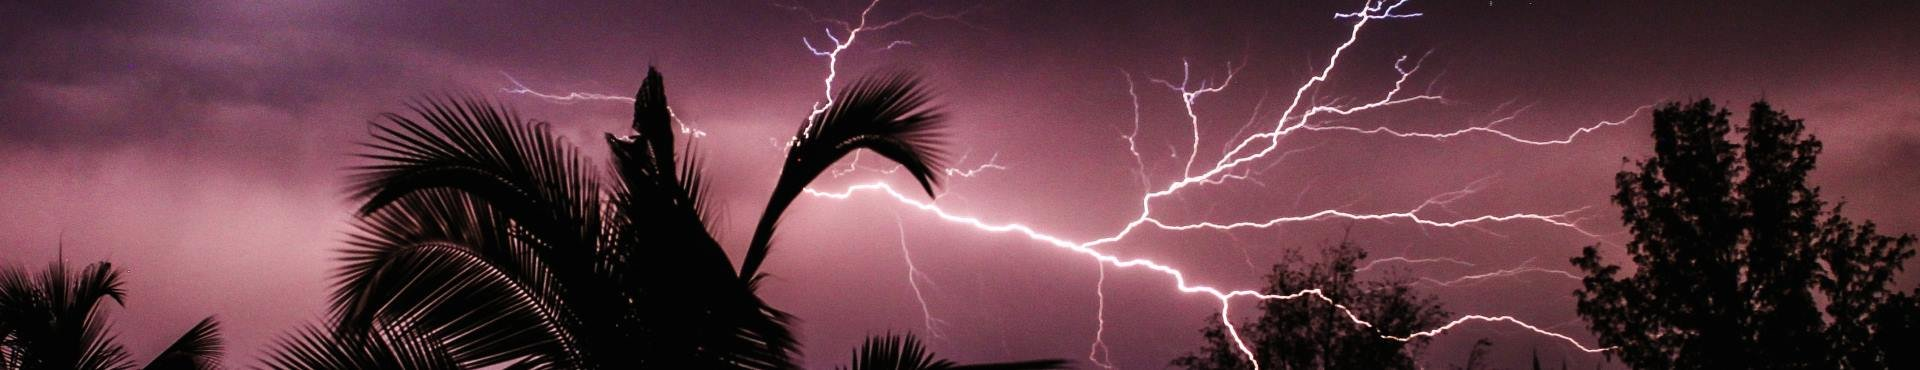 lightning-sky